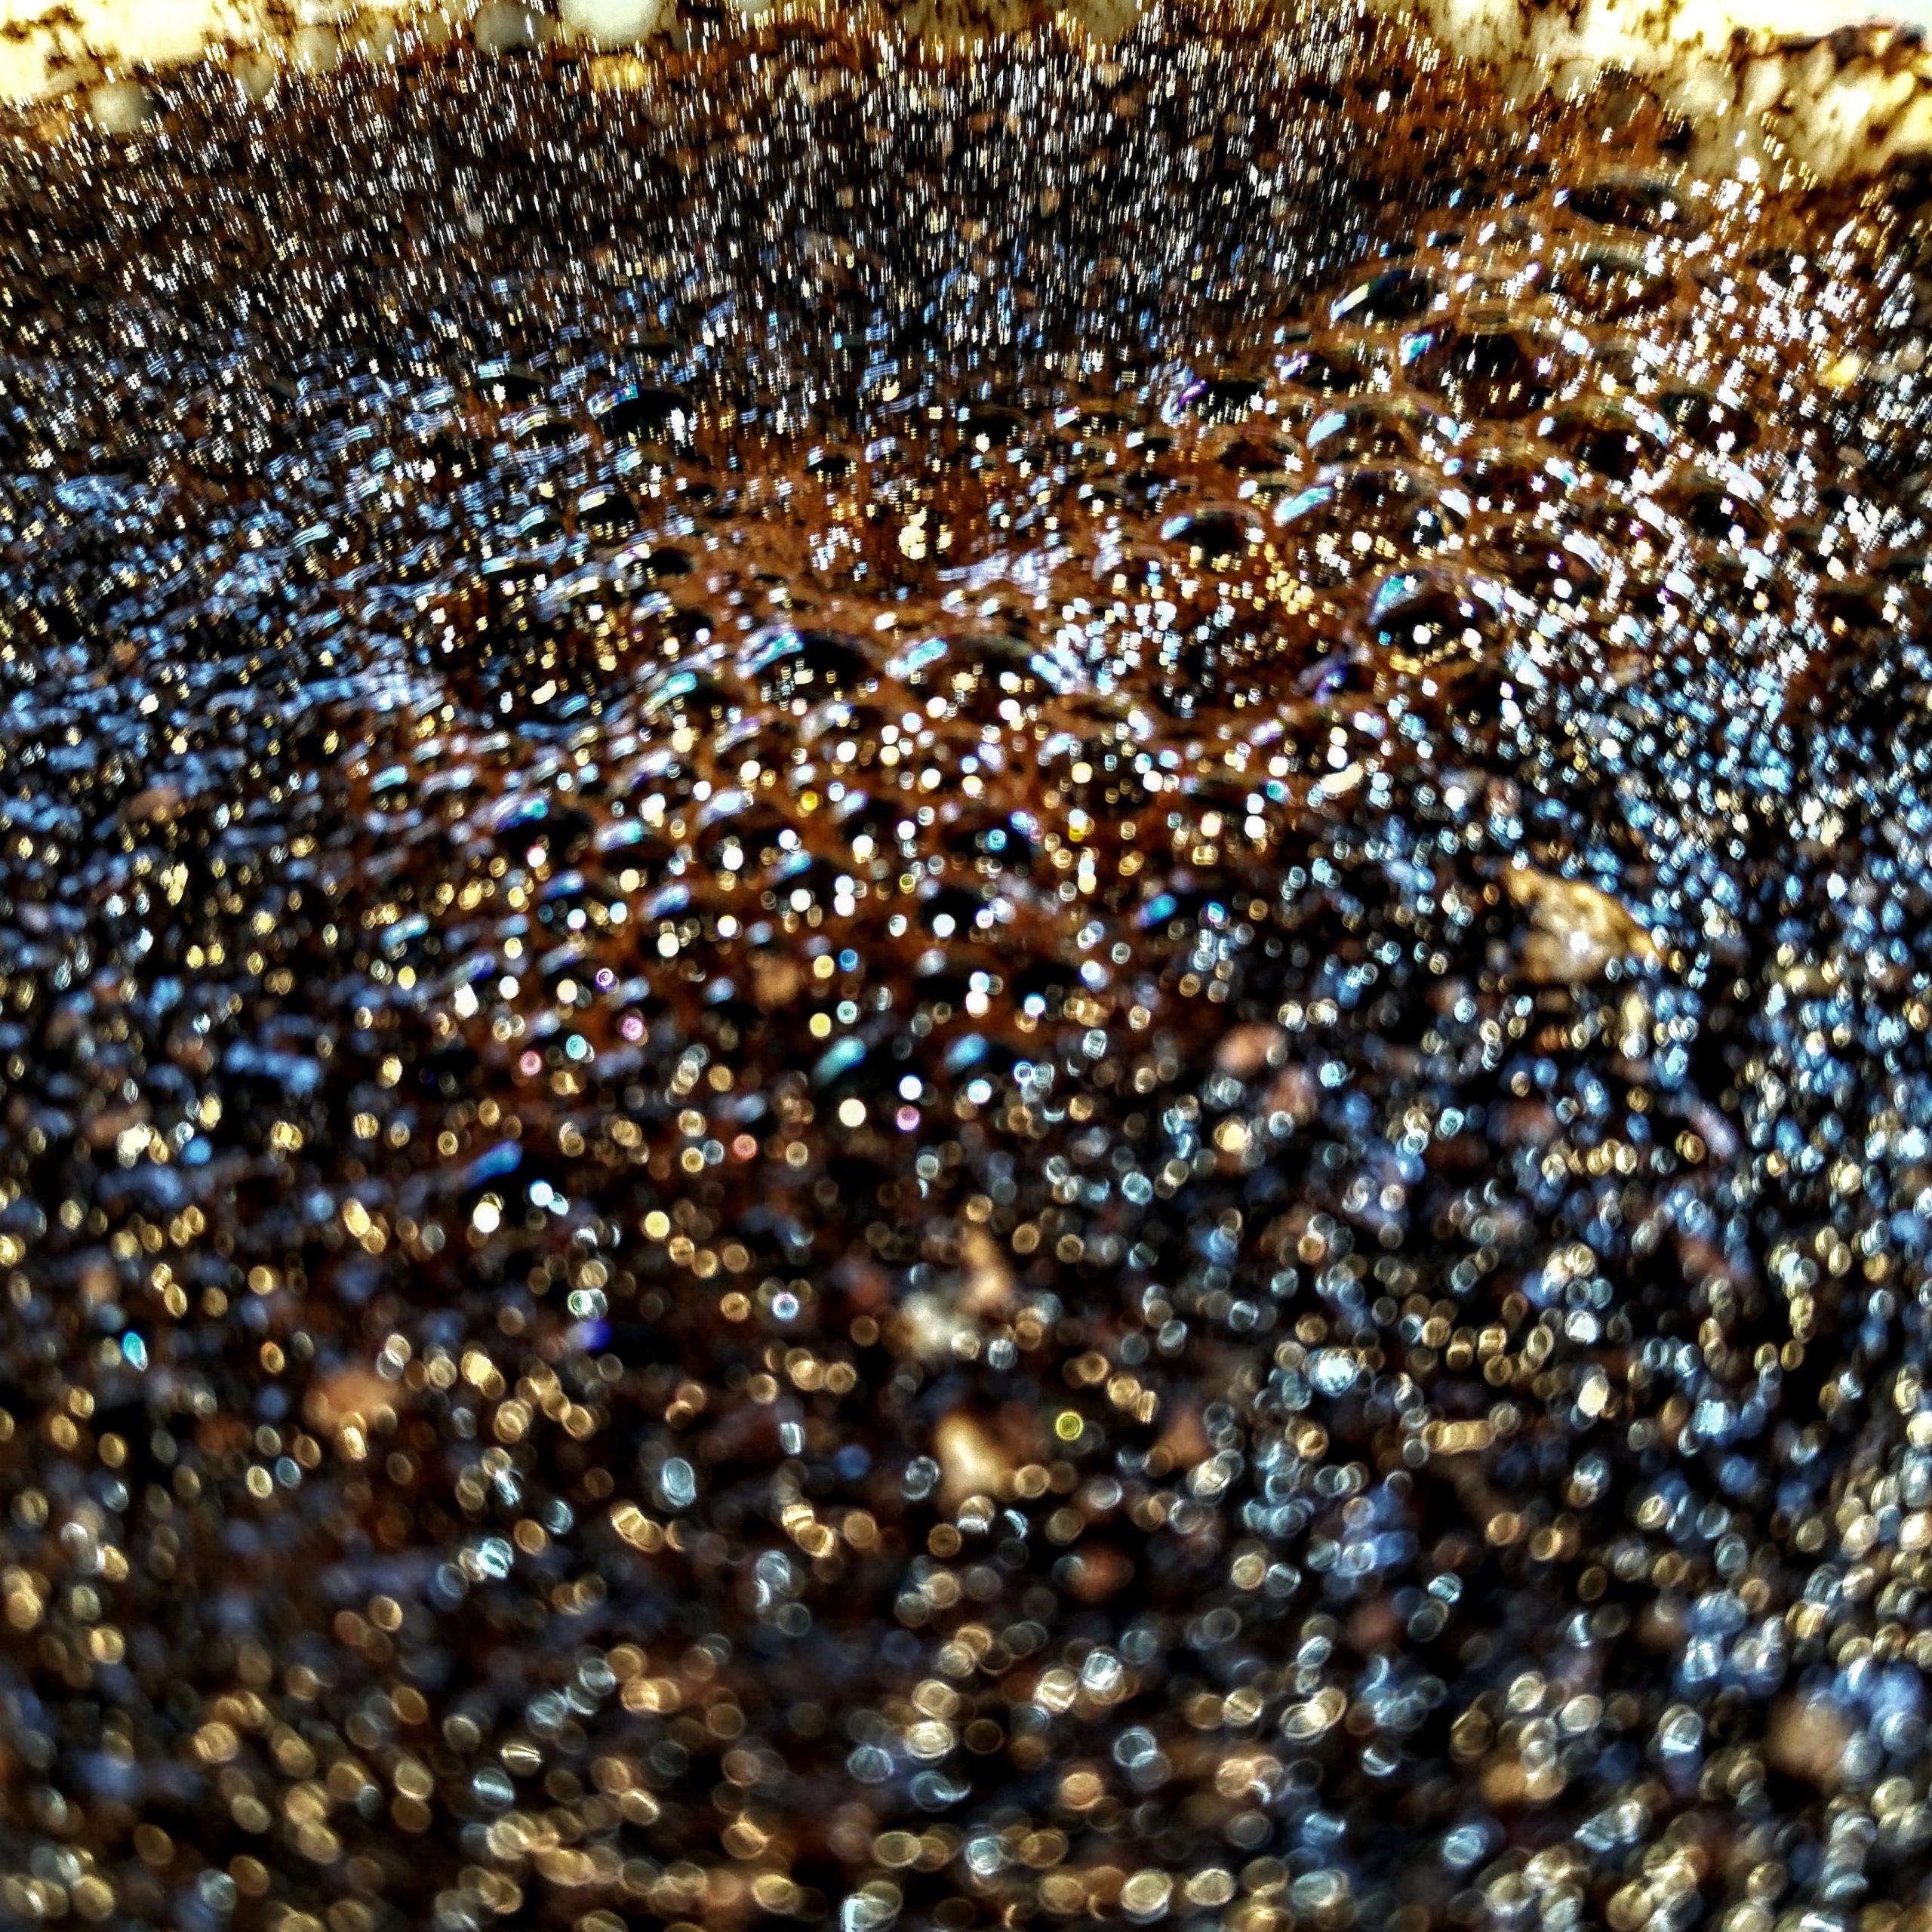 Coffee Bloom, tasting coffee processes